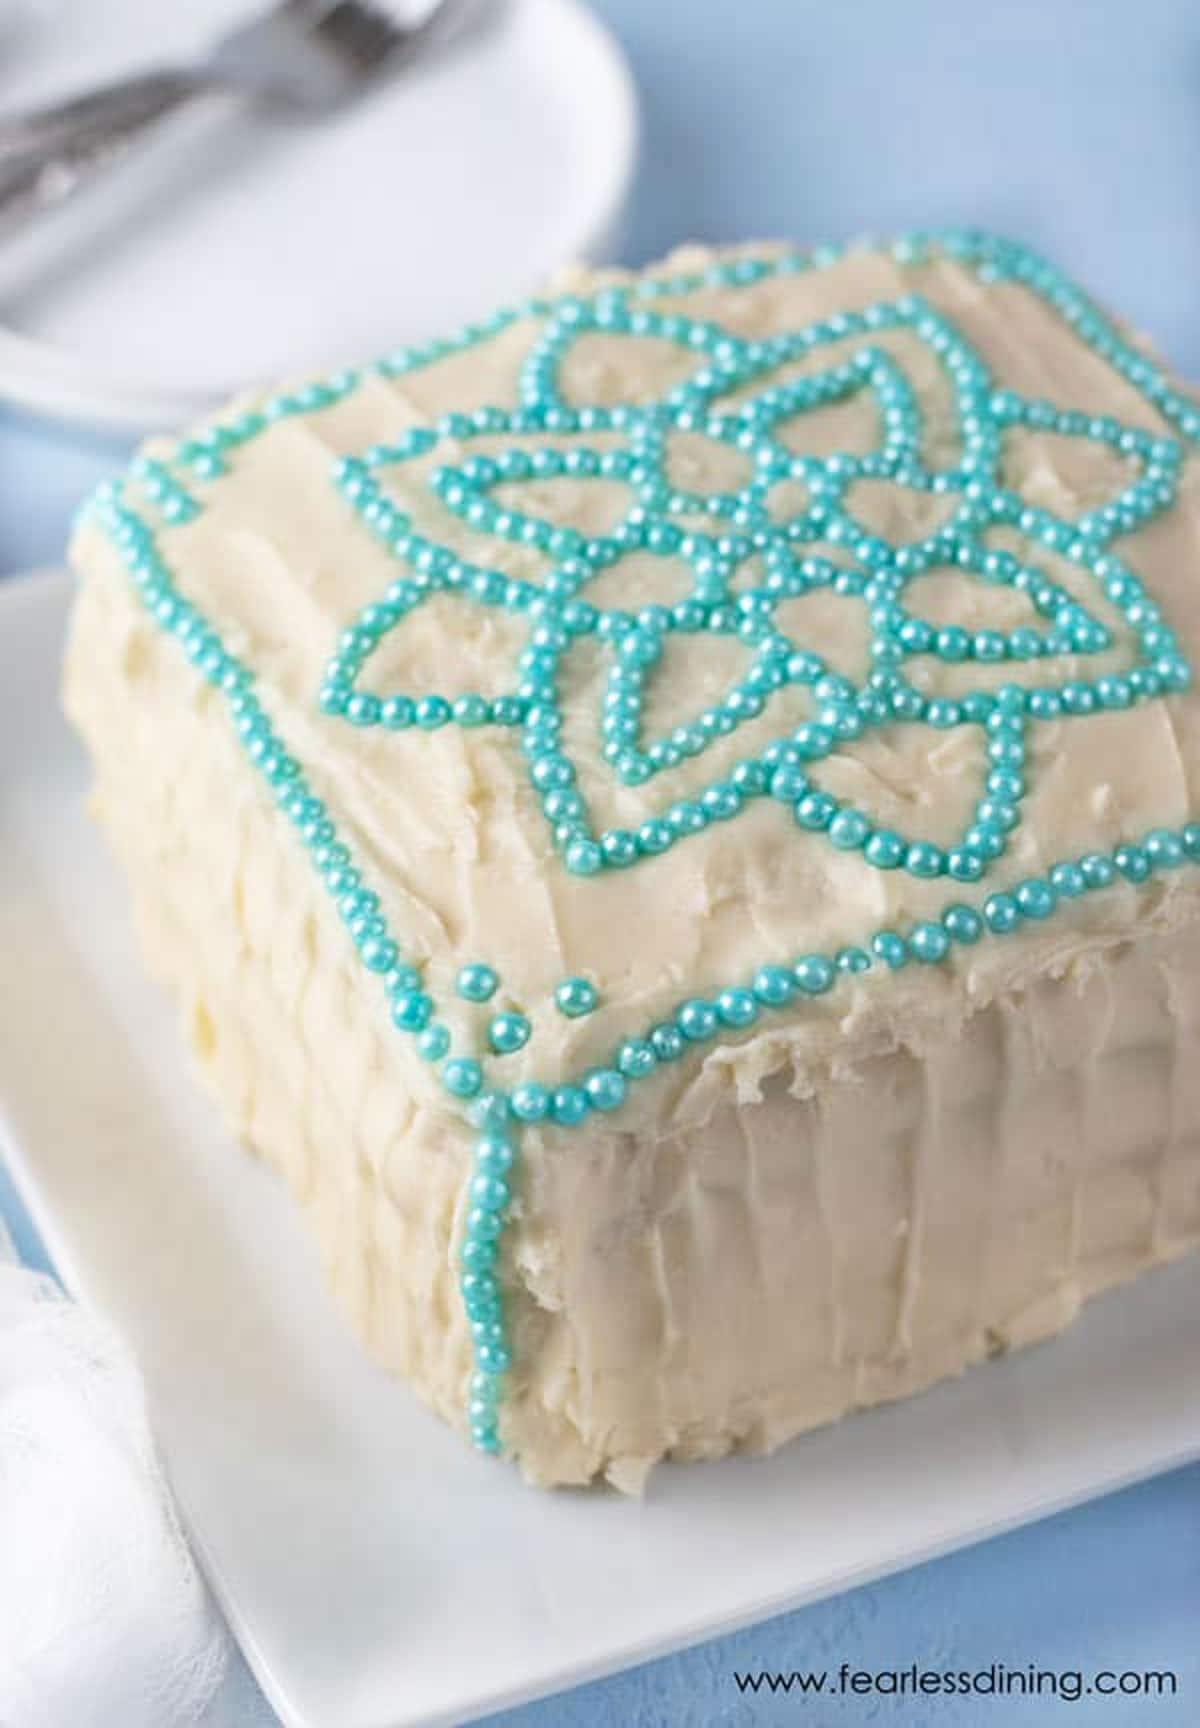 a decorated square shaped vanilla cake